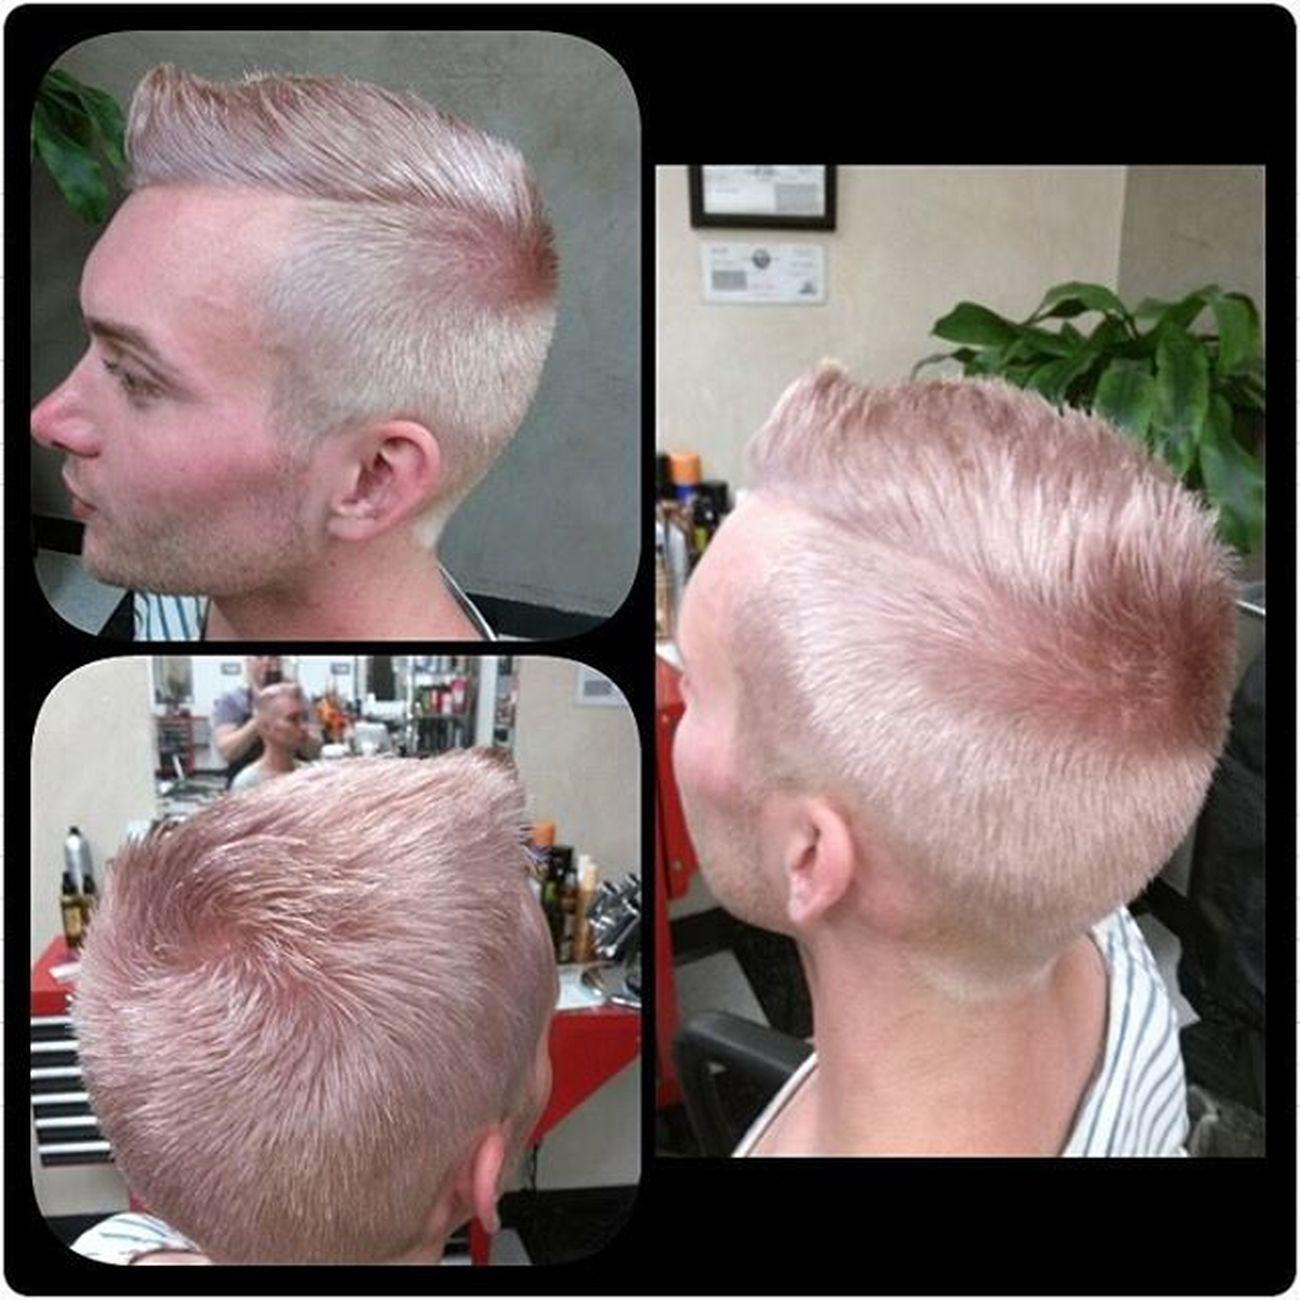 Beautybytammy Shadeseq Shades Mainstreethaircompany huntingtonbeach pinkie pinkhairdontcare pinkhair glamorous huntingtonbeachpier pacificcoasthighway pacificcoast